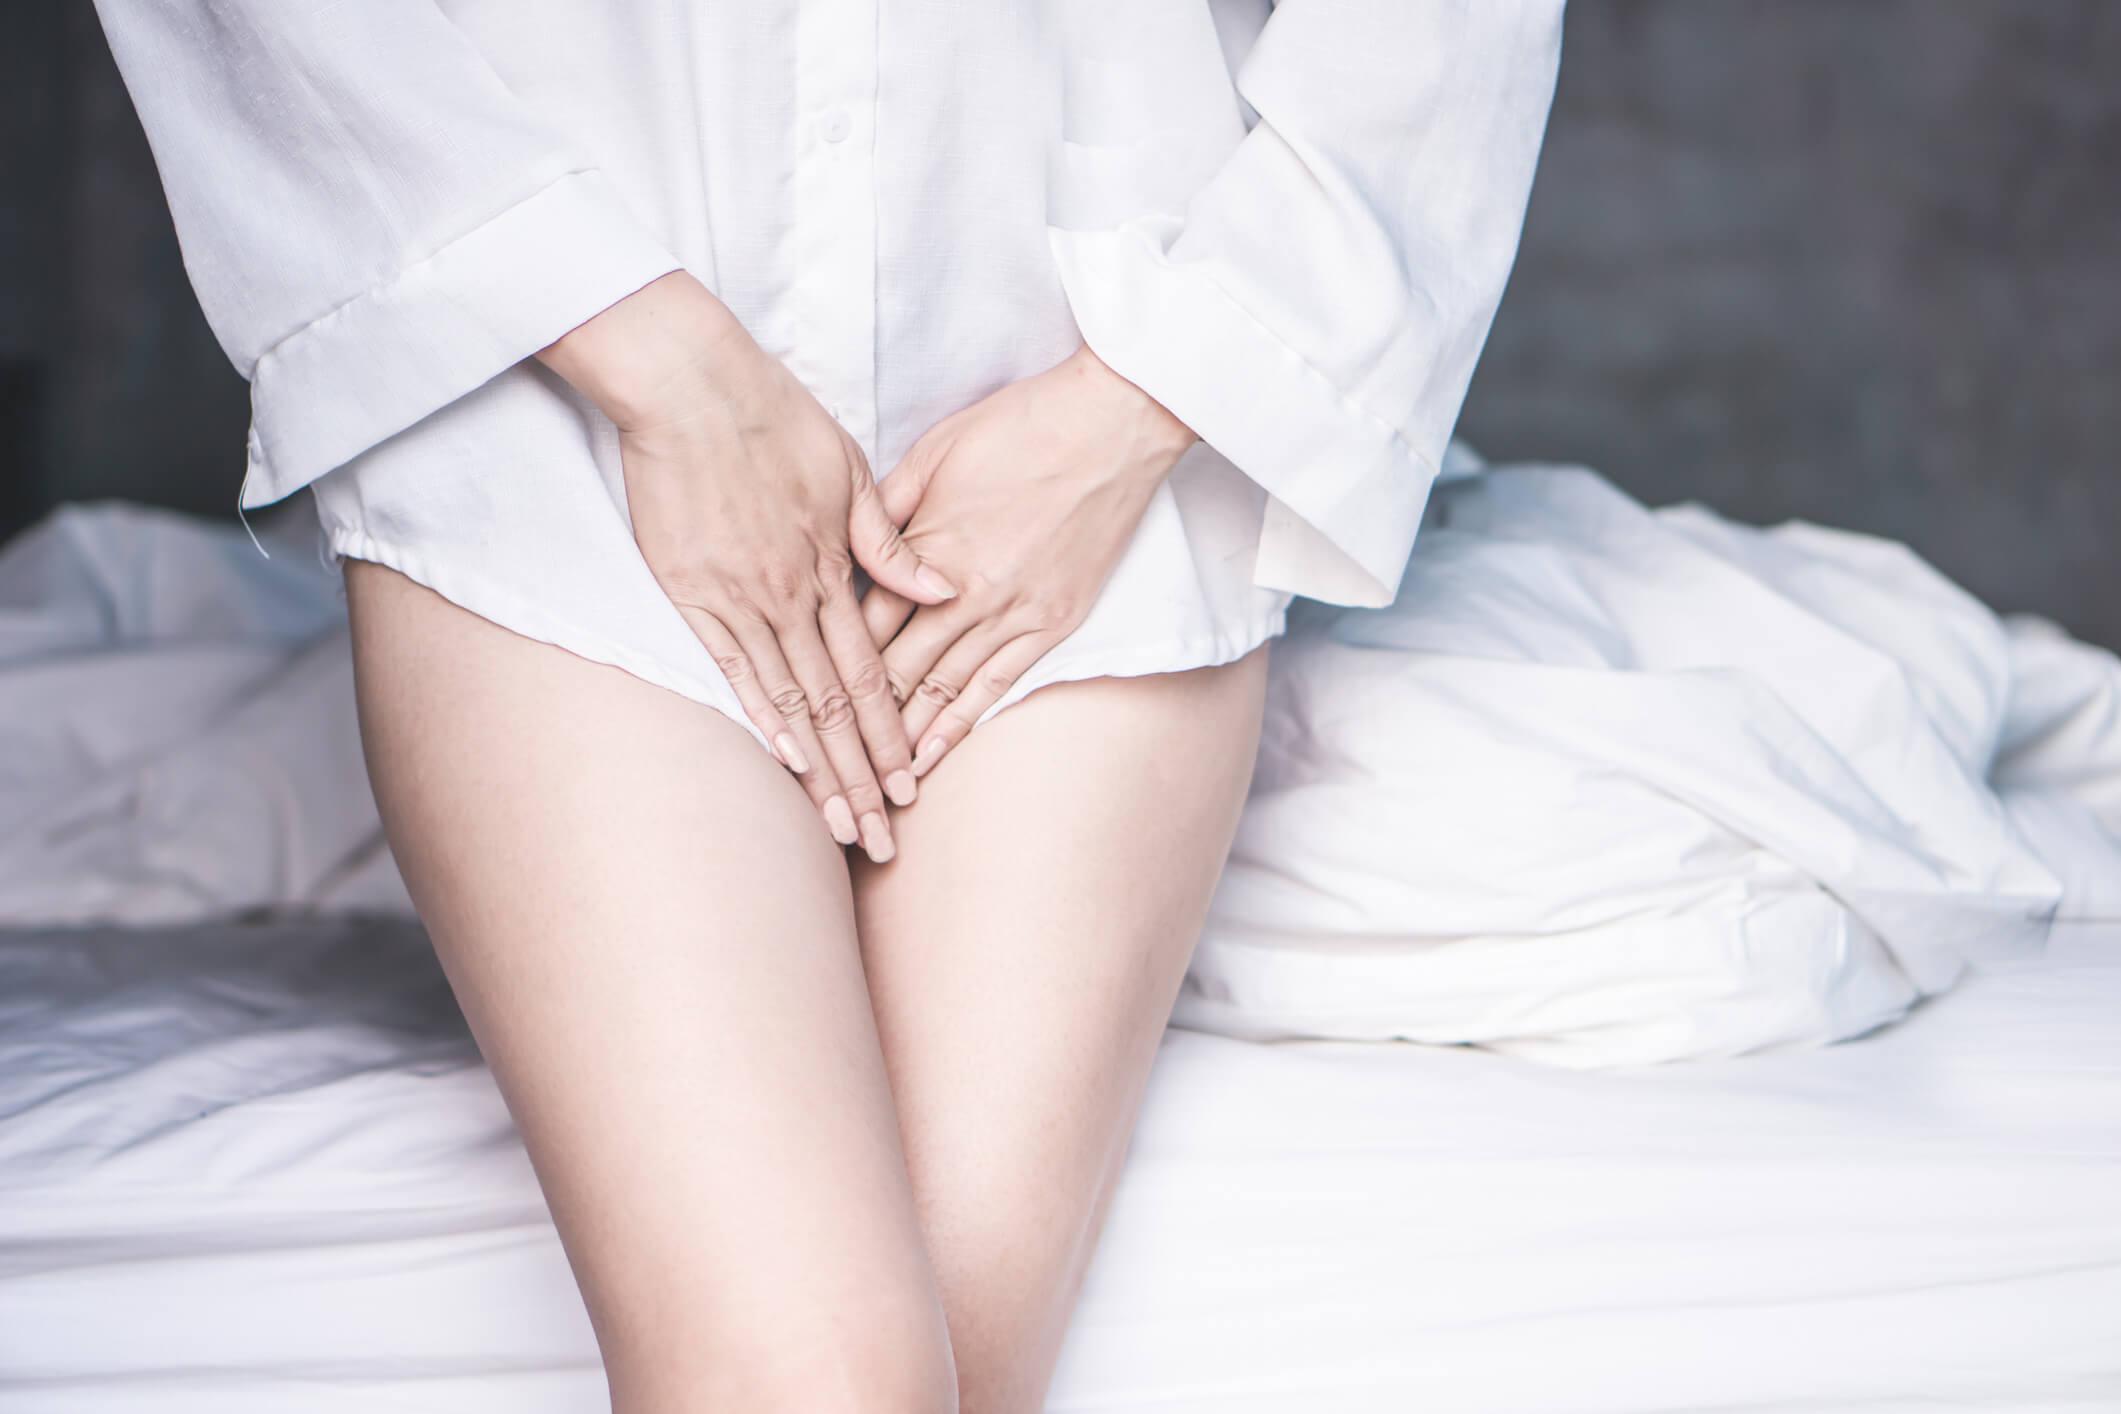 Pólipo uterino: conheça os sintomas e saiba como ele afeta a fertilidade